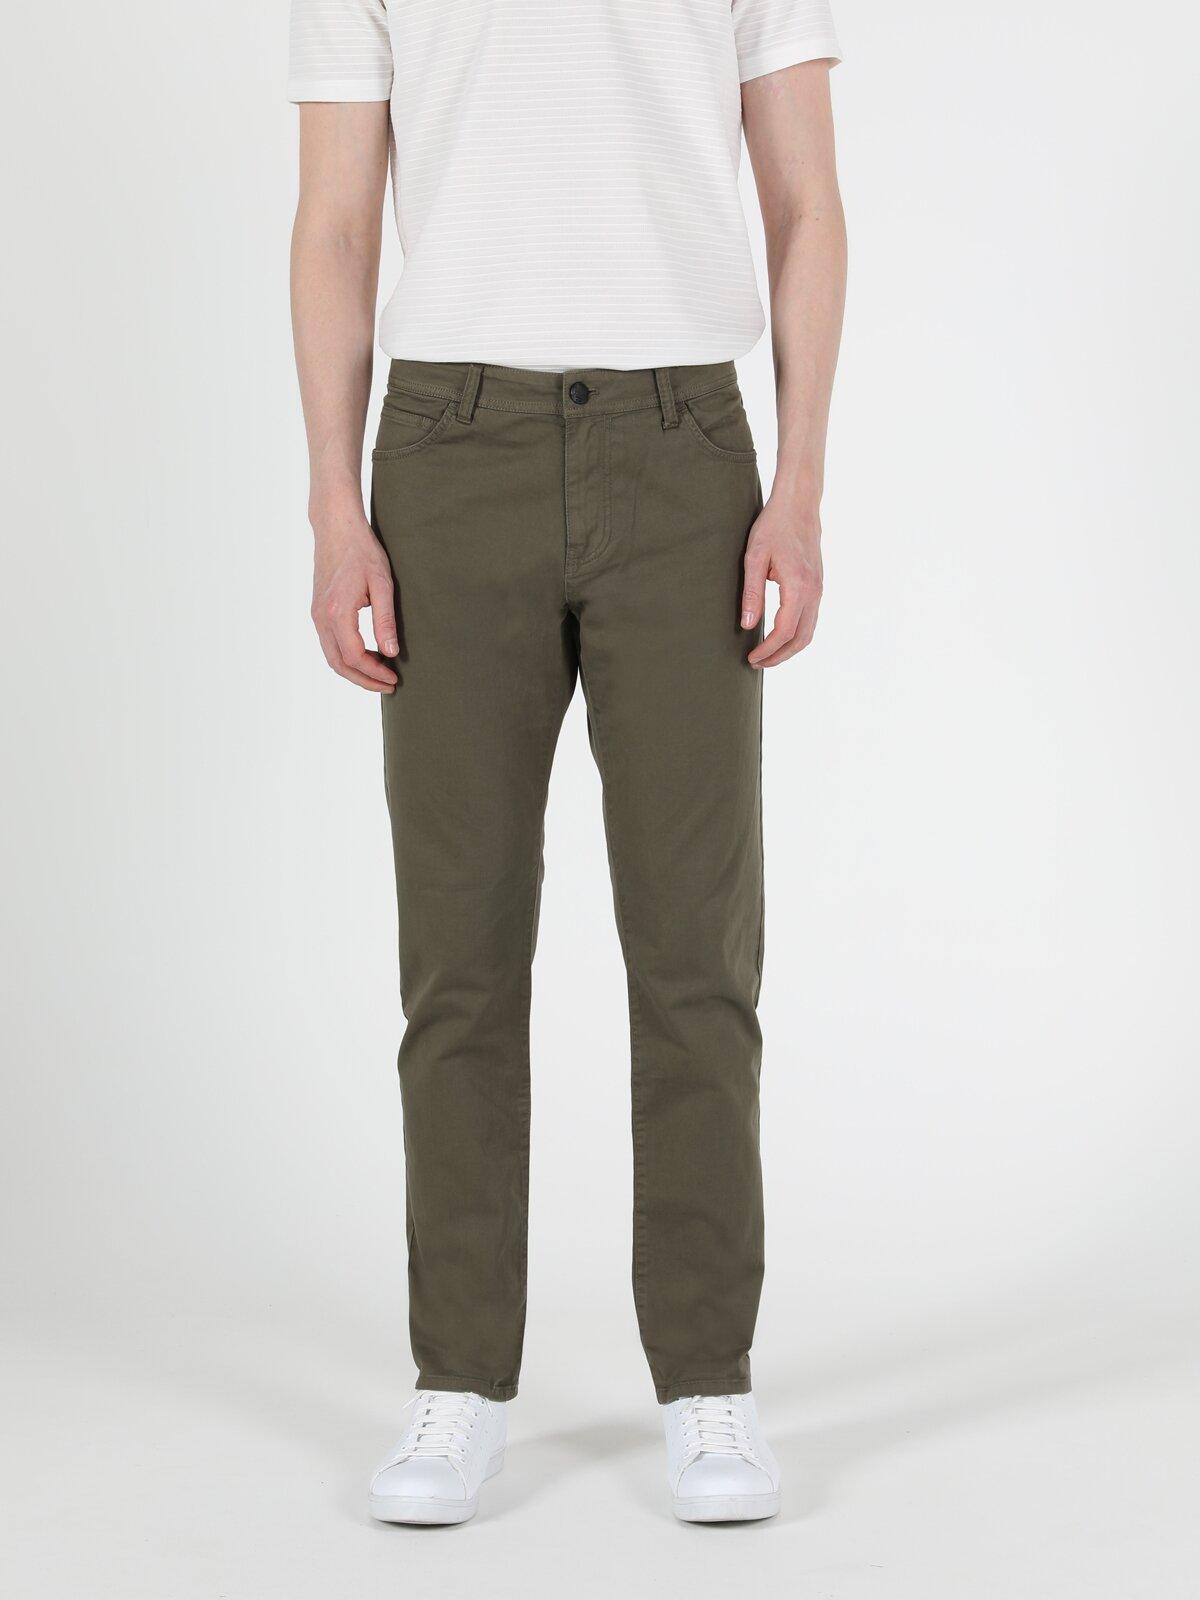 Straight Fit Düşük Bel Düz Paça  Erkek Haki Pantolon